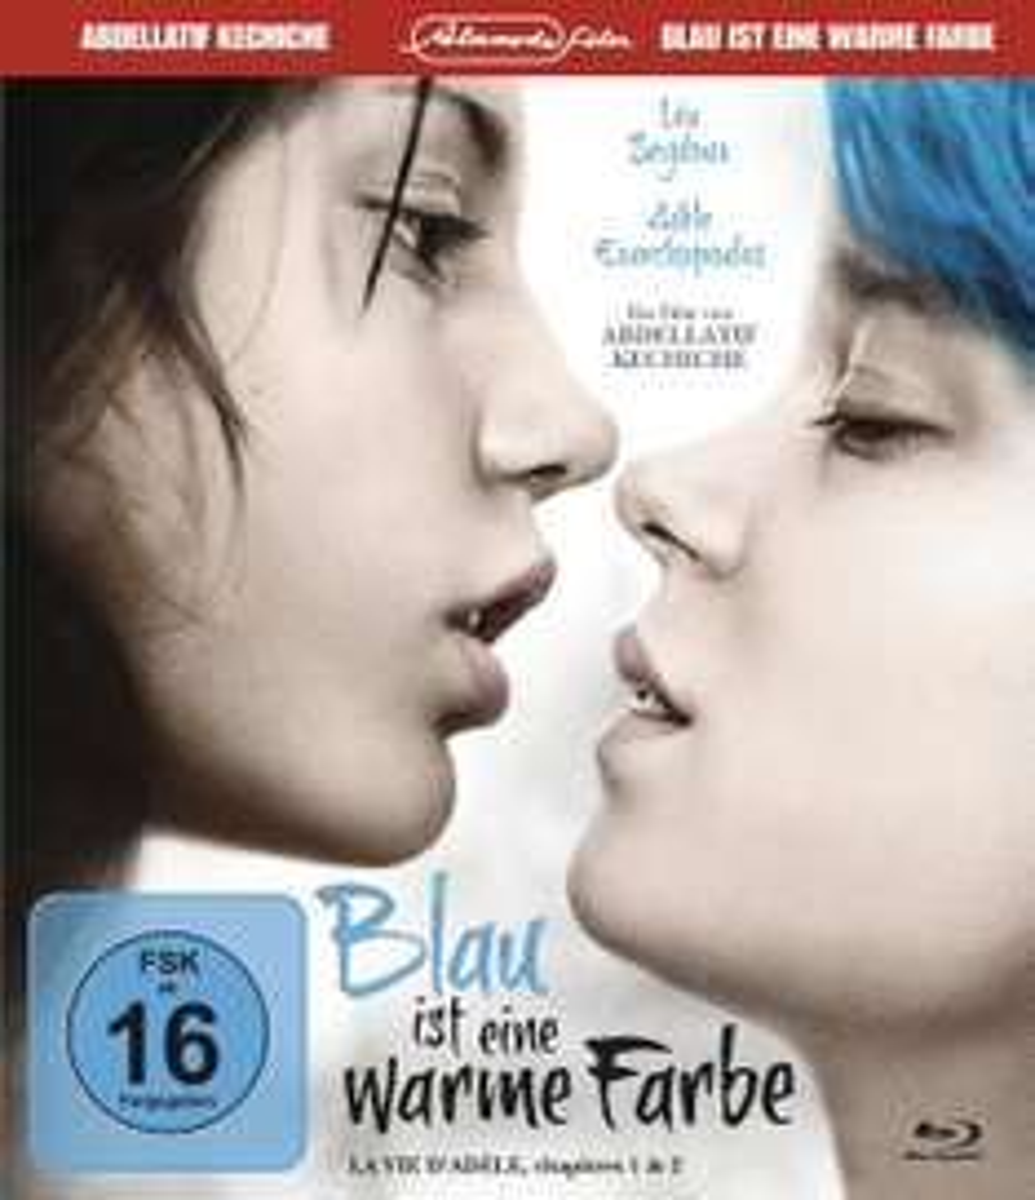 [Blu-ray] Blau ist eine warme Farbe (La vie d'Adèle, chapitres 1 & 2) [Special Edition] für 5,83 mit PRIME @amazon.de